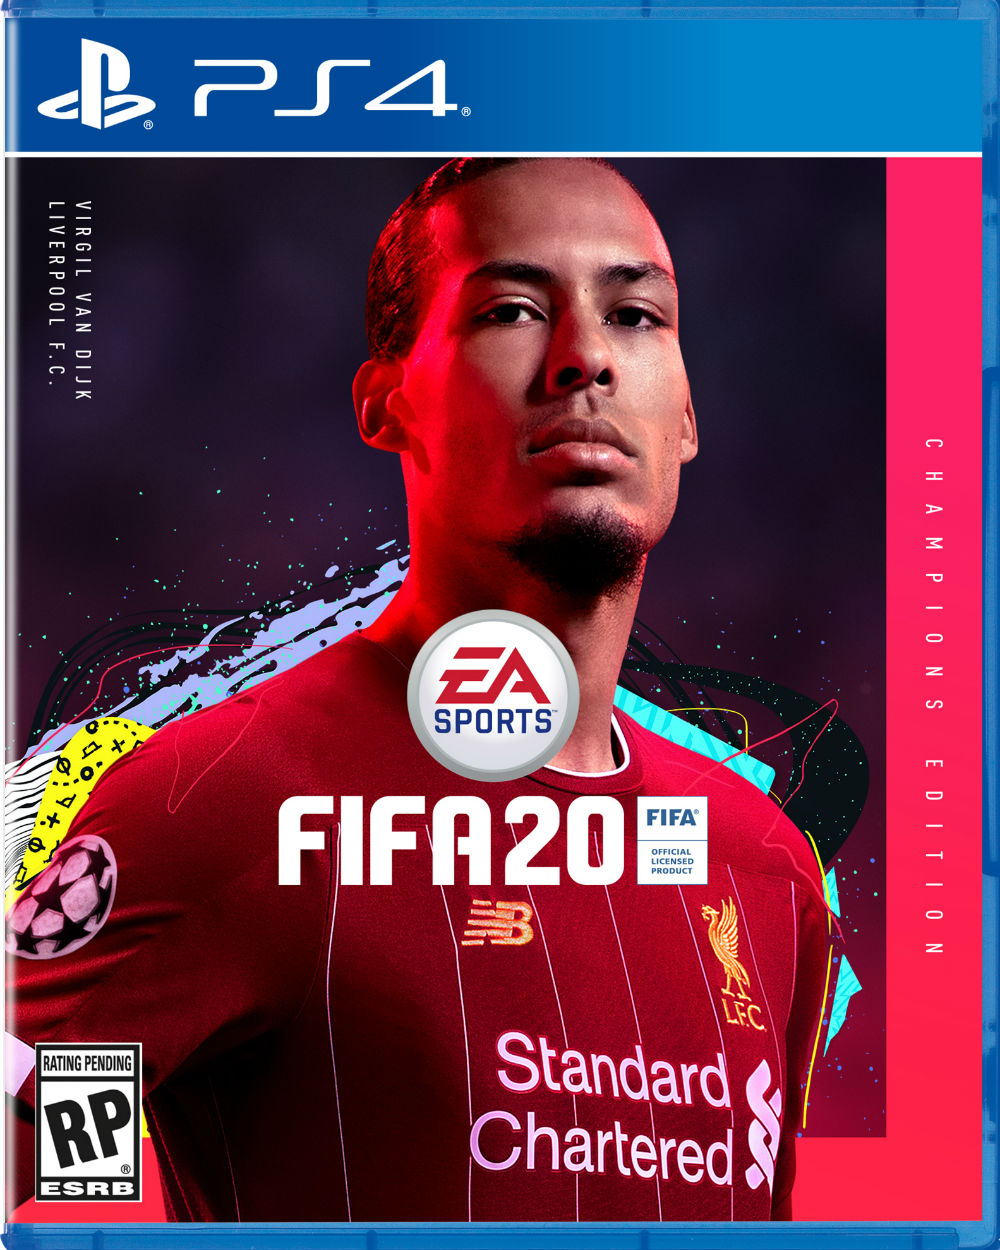 Virgil van Dijk to be EA SPORTS' FIFA 20 Champions Edition cover star -  Liverpool FC